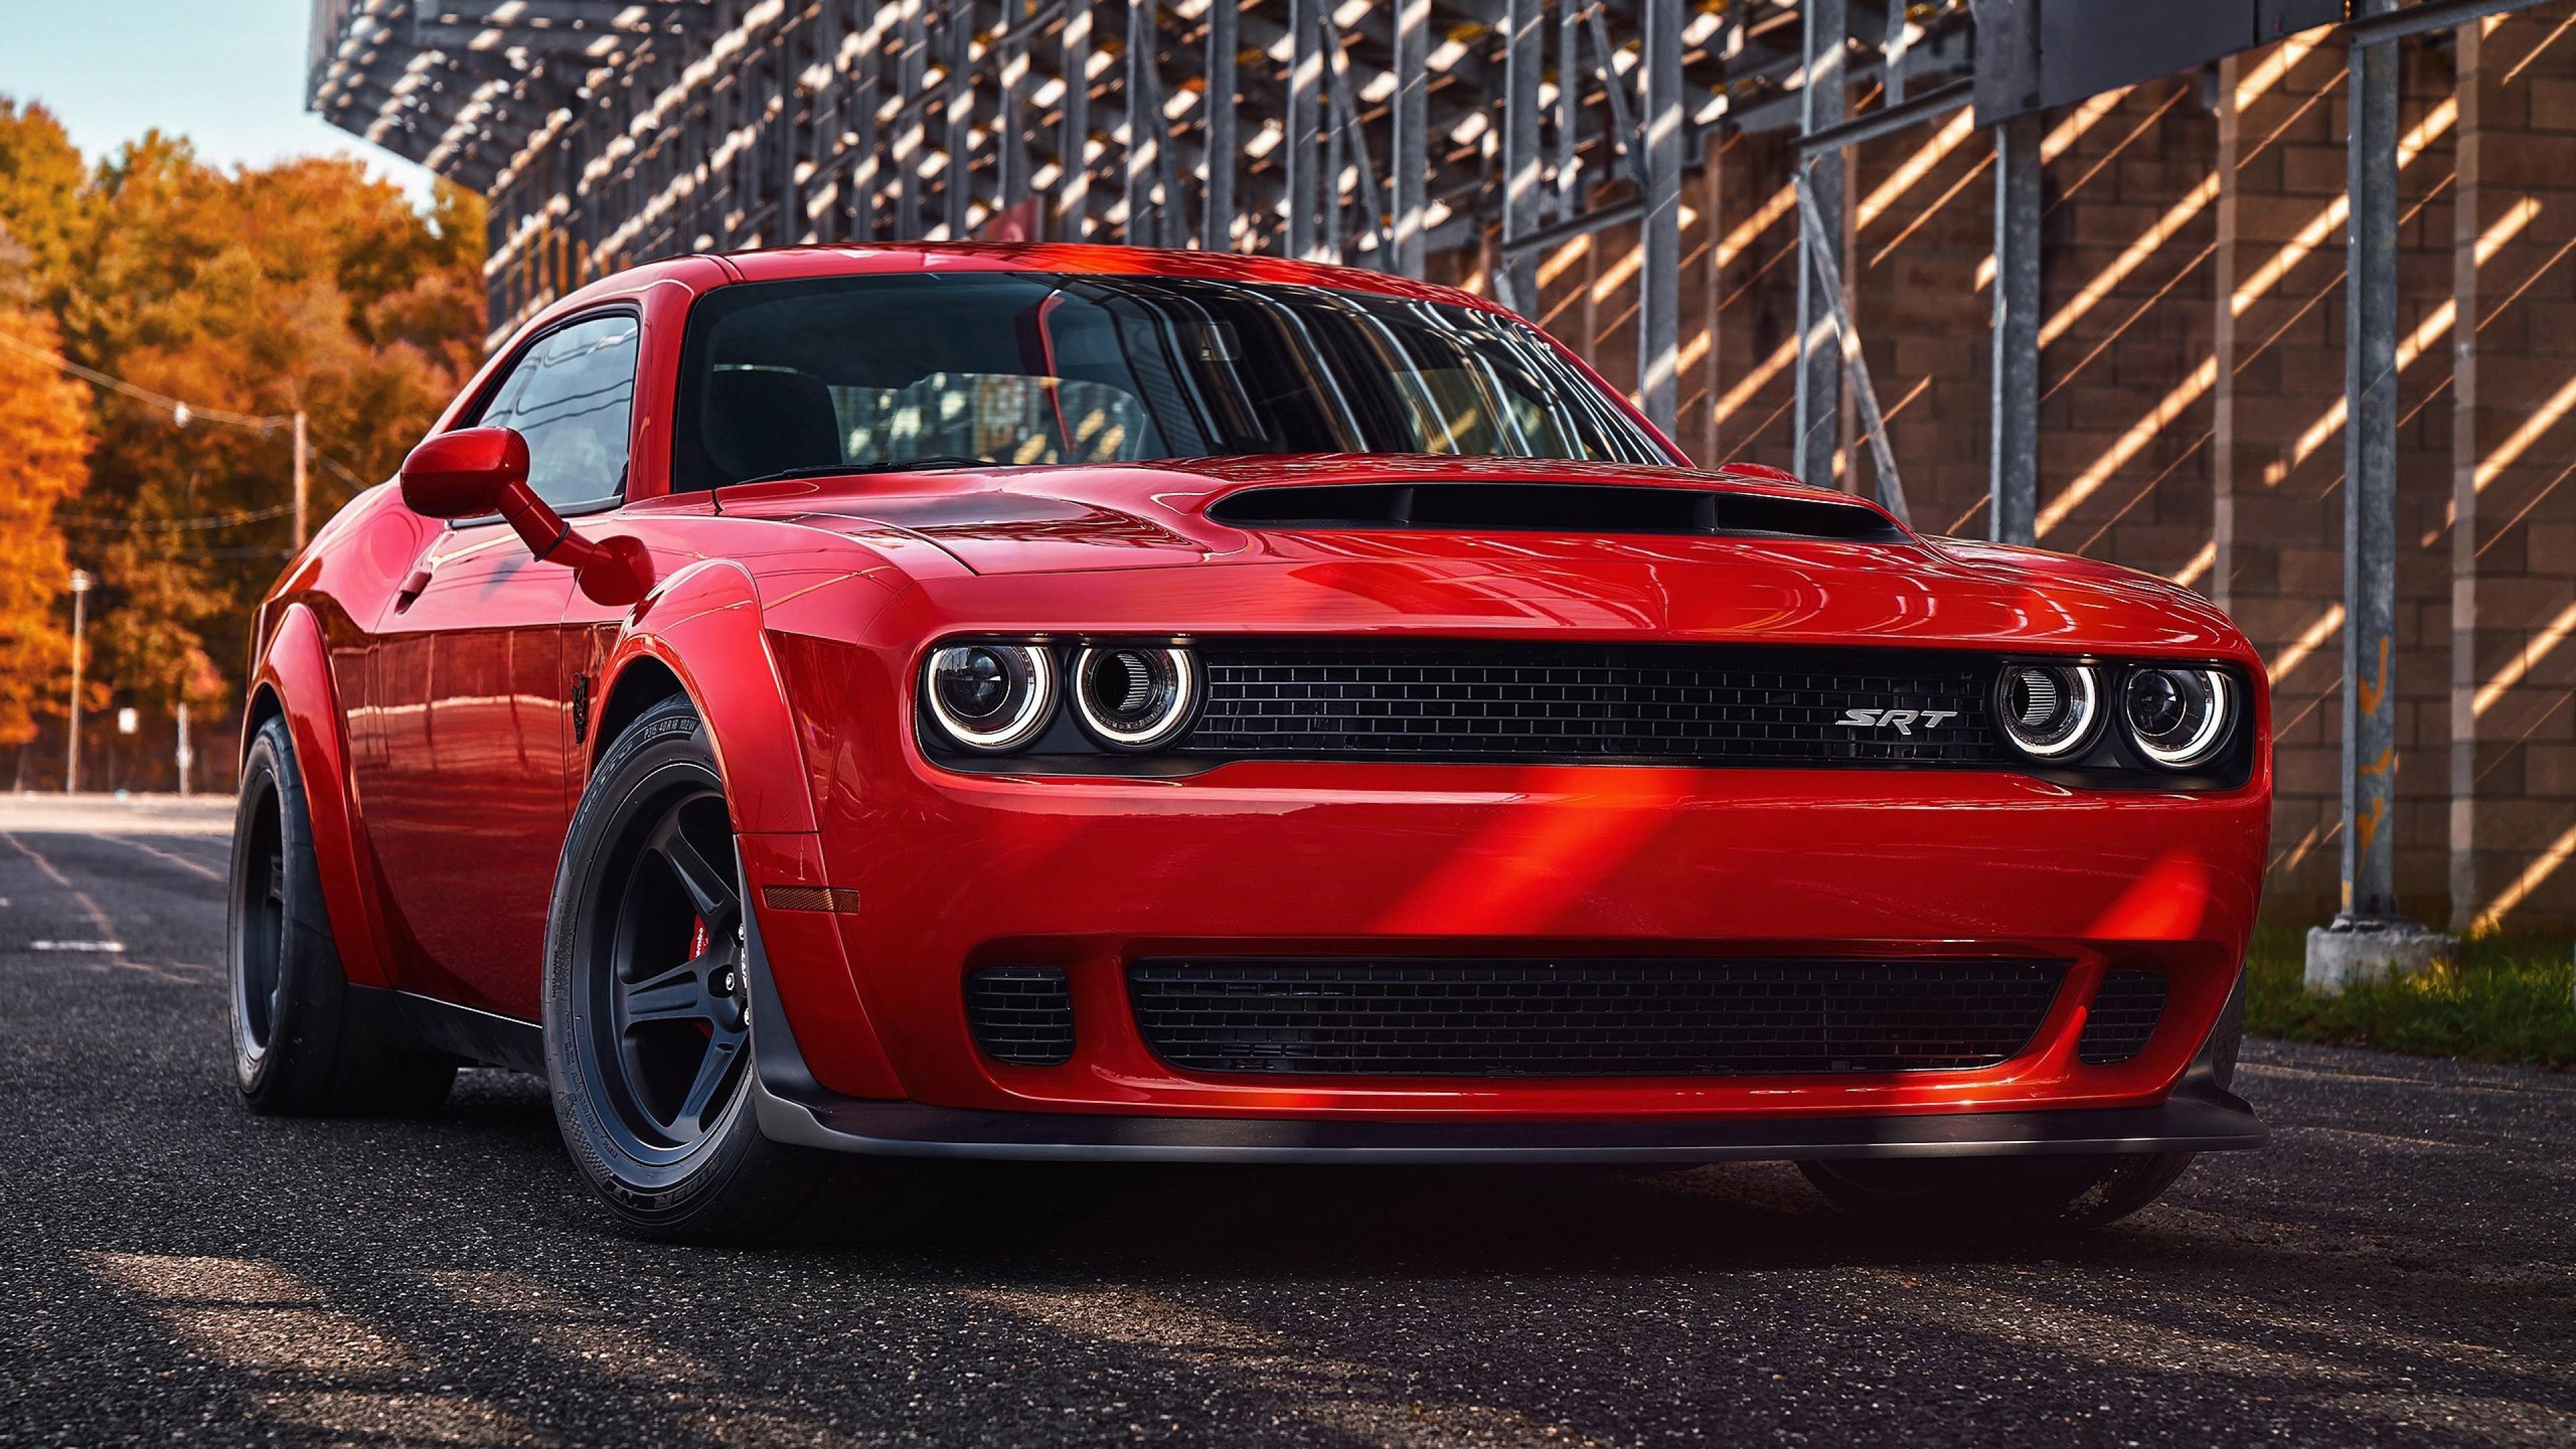 4k Car Wallpaper Dodge Demon Challenger Srt Muscle - 4k ...